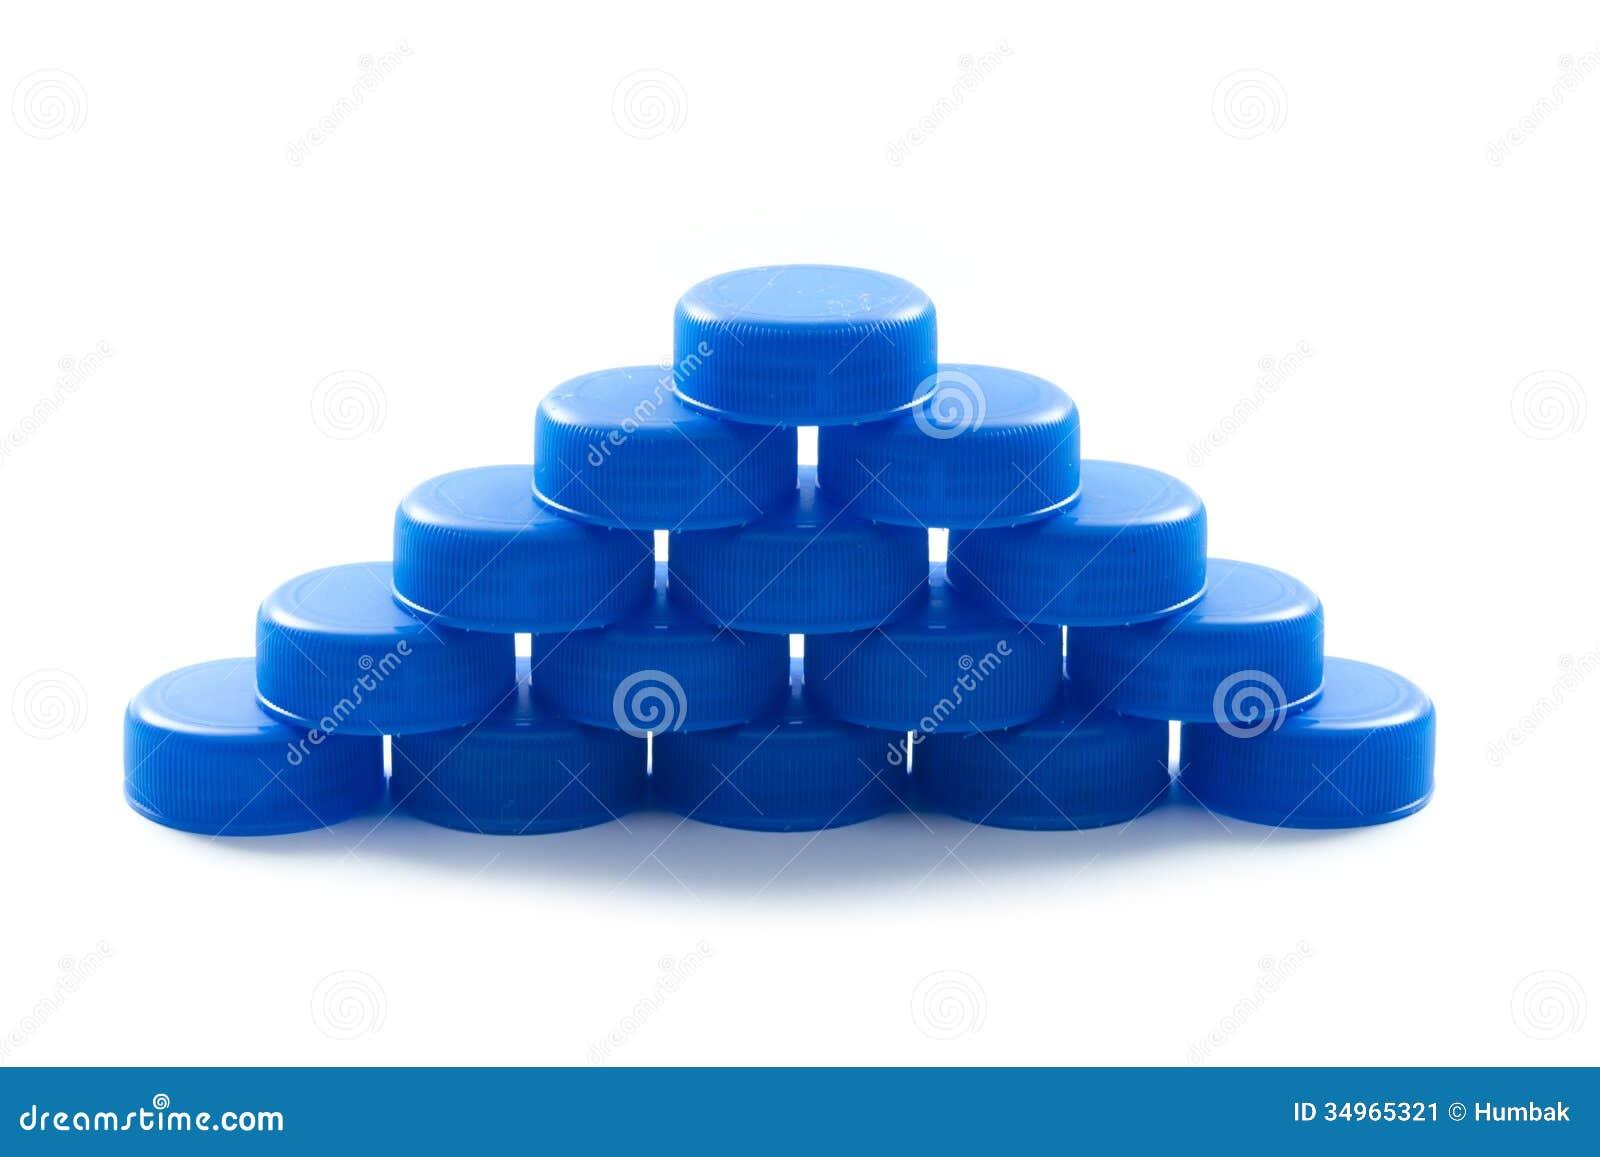 Plastic cap stock image image 34965321 - Plastic bottles with caps ...